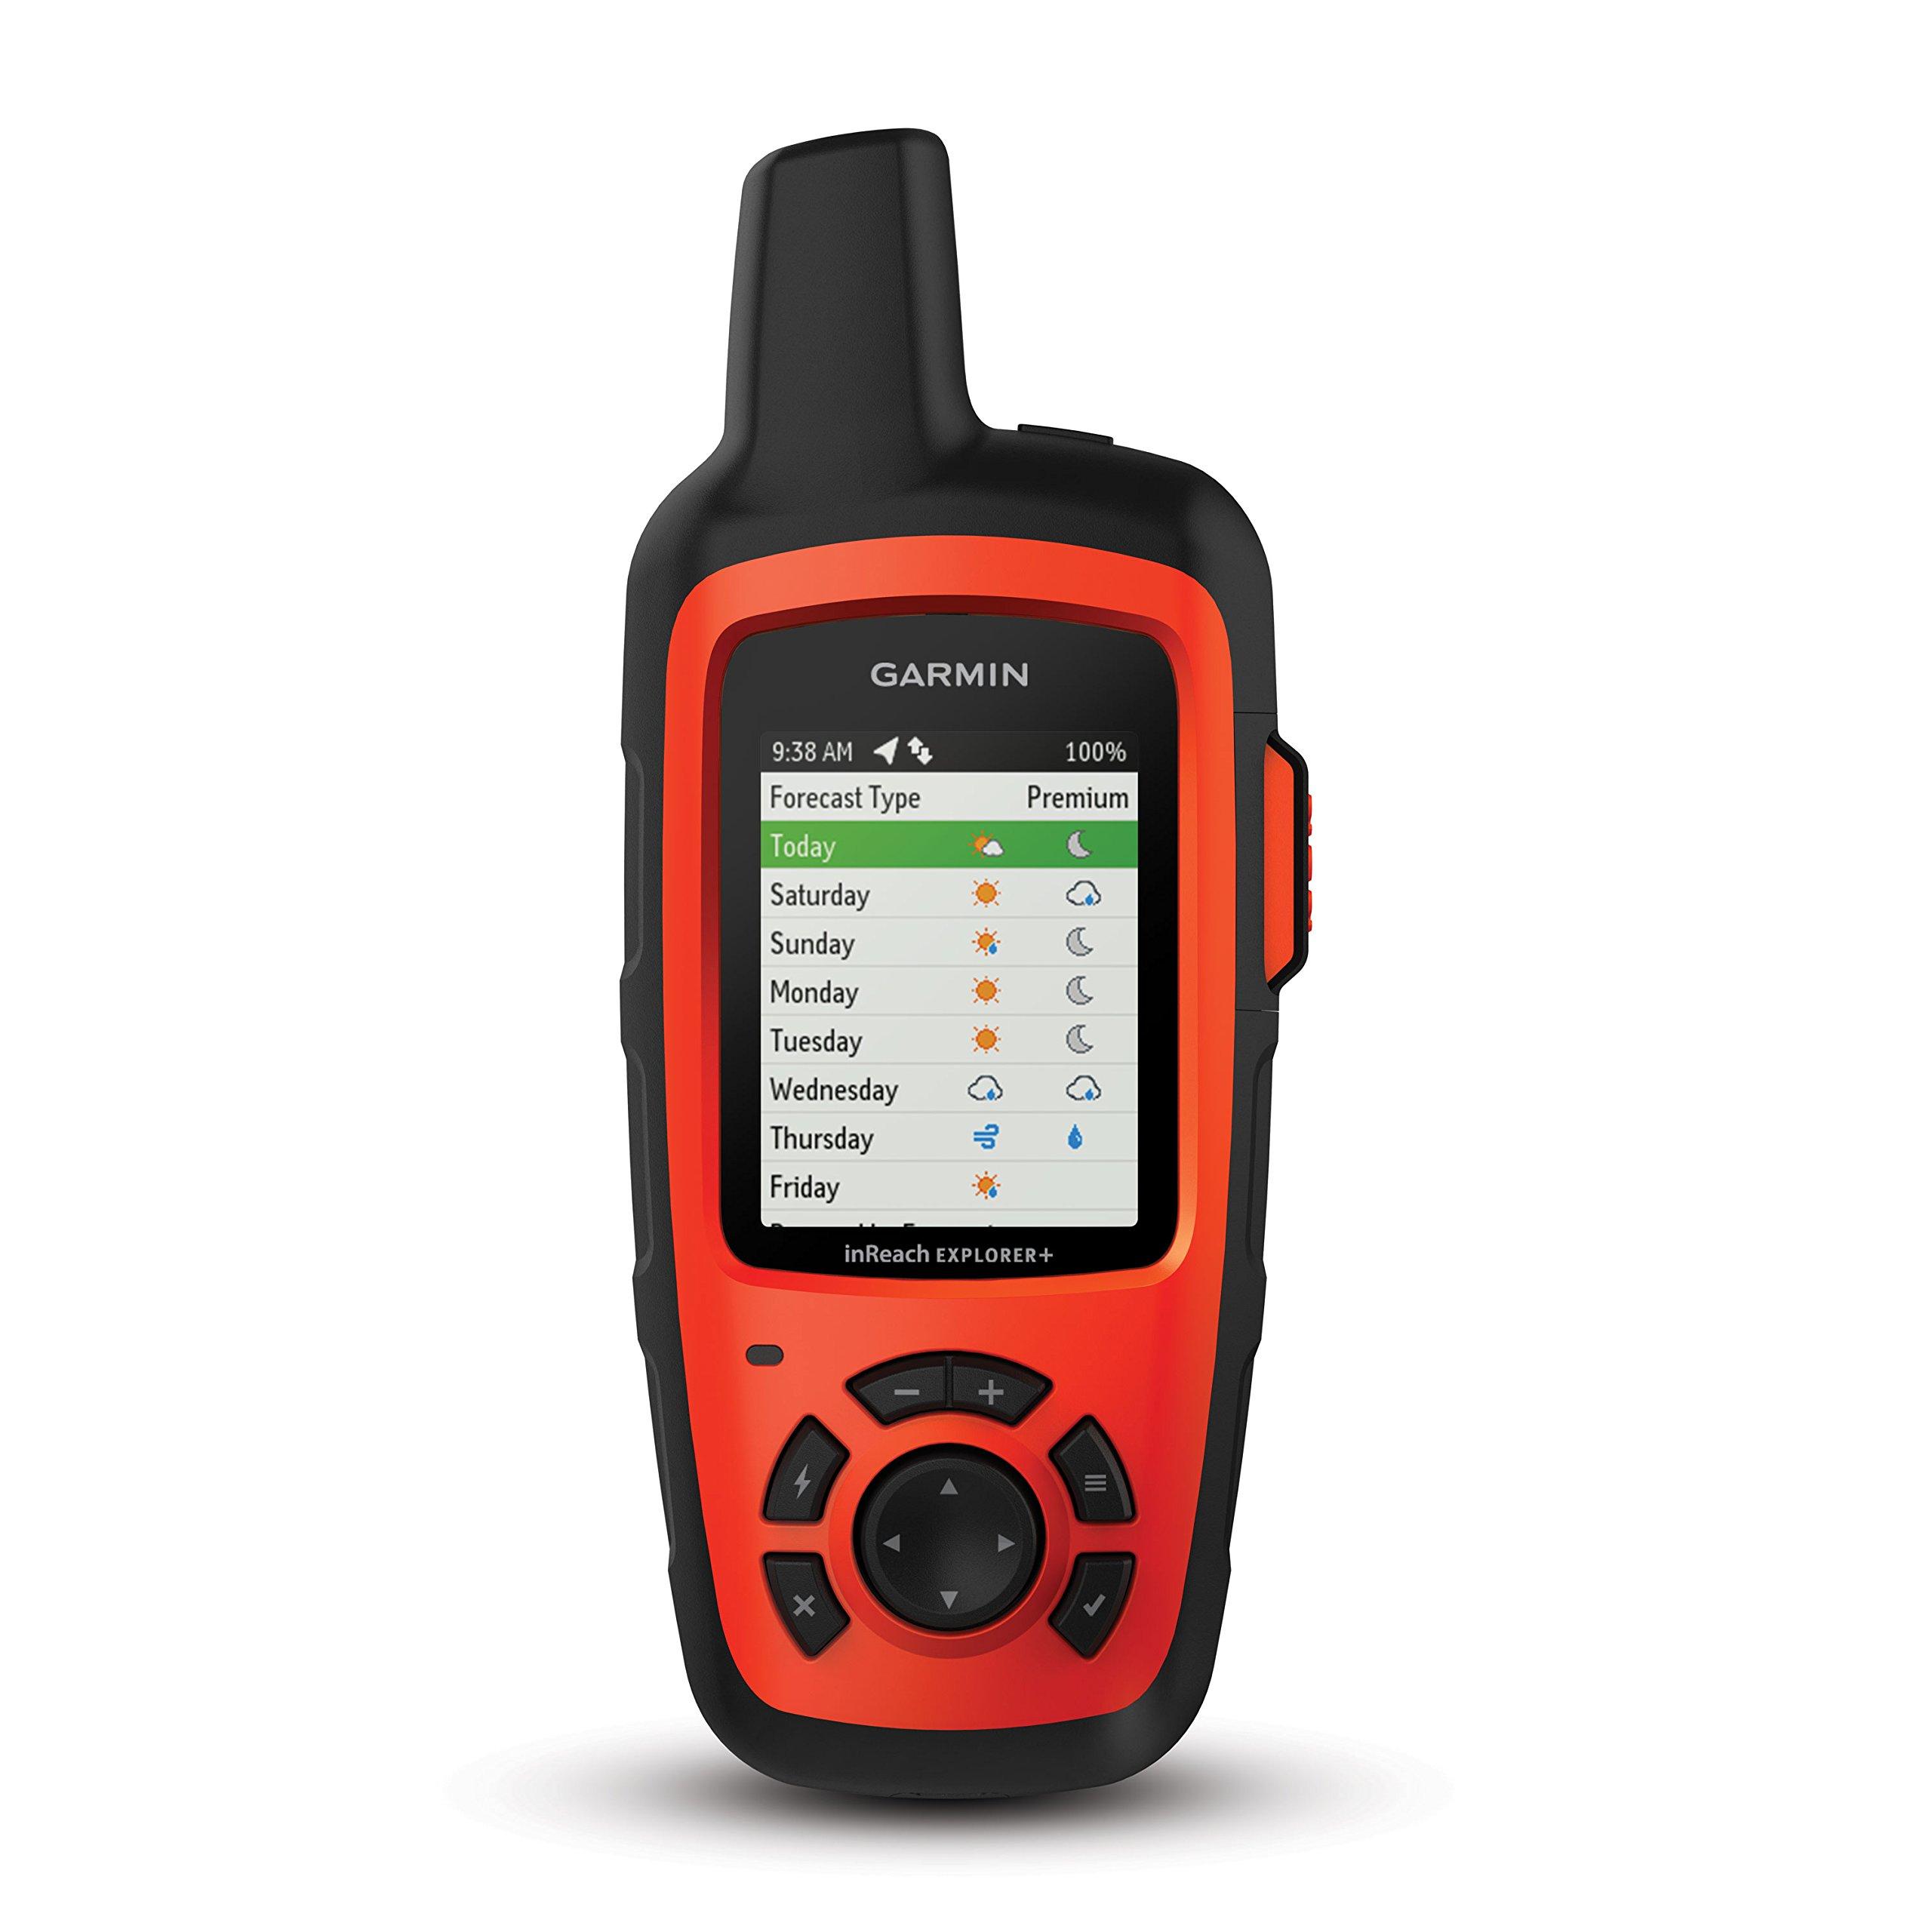 Garmin inReach Explorer+, Handheld Satellite Communicator with TOPO Maps and GPS Navigation by Garmin